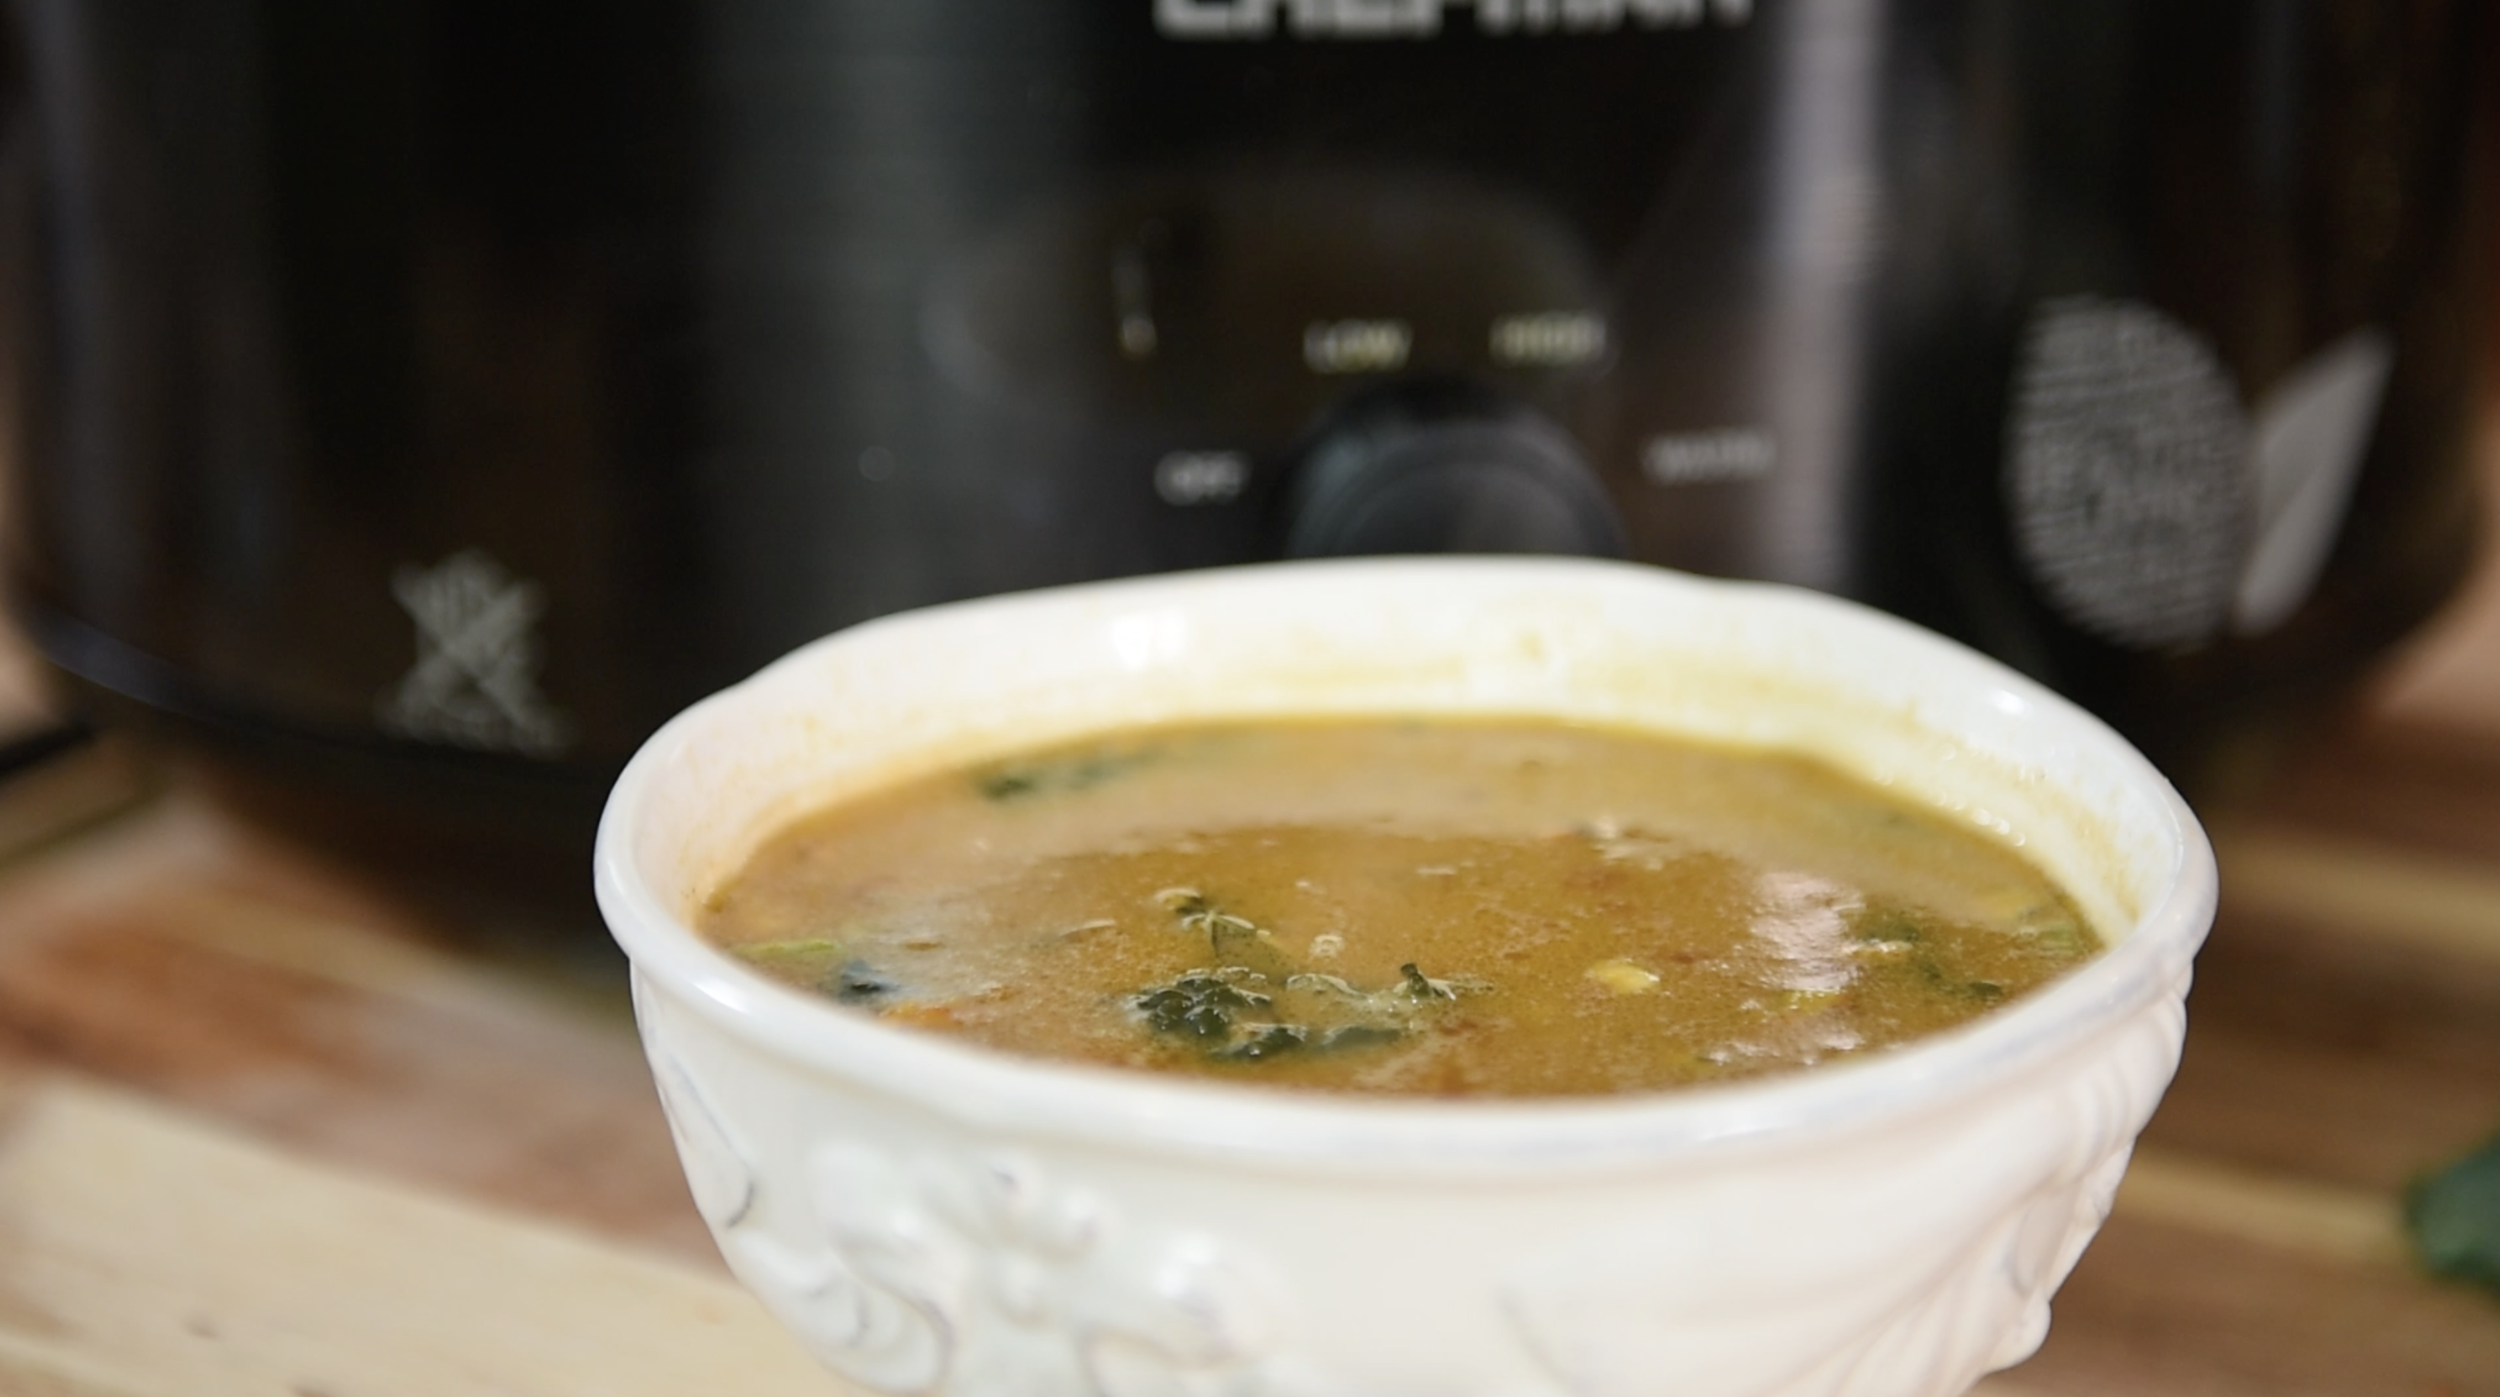 Krewella's Healing Soup